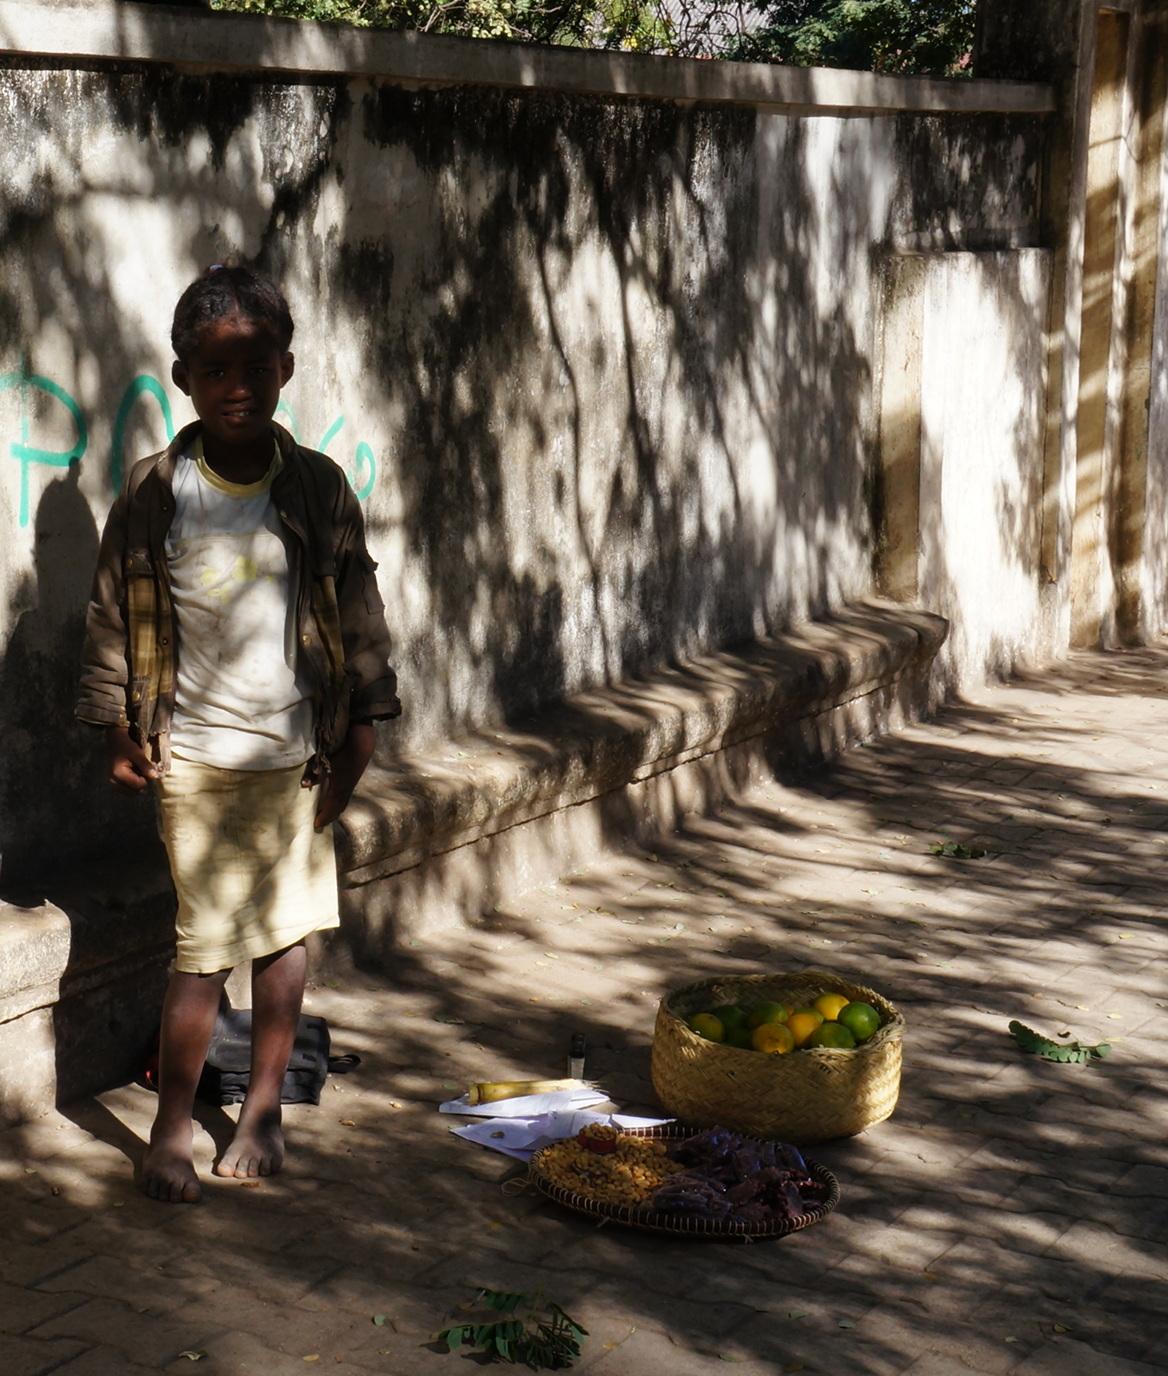 Madagascar - girl selling mandarins